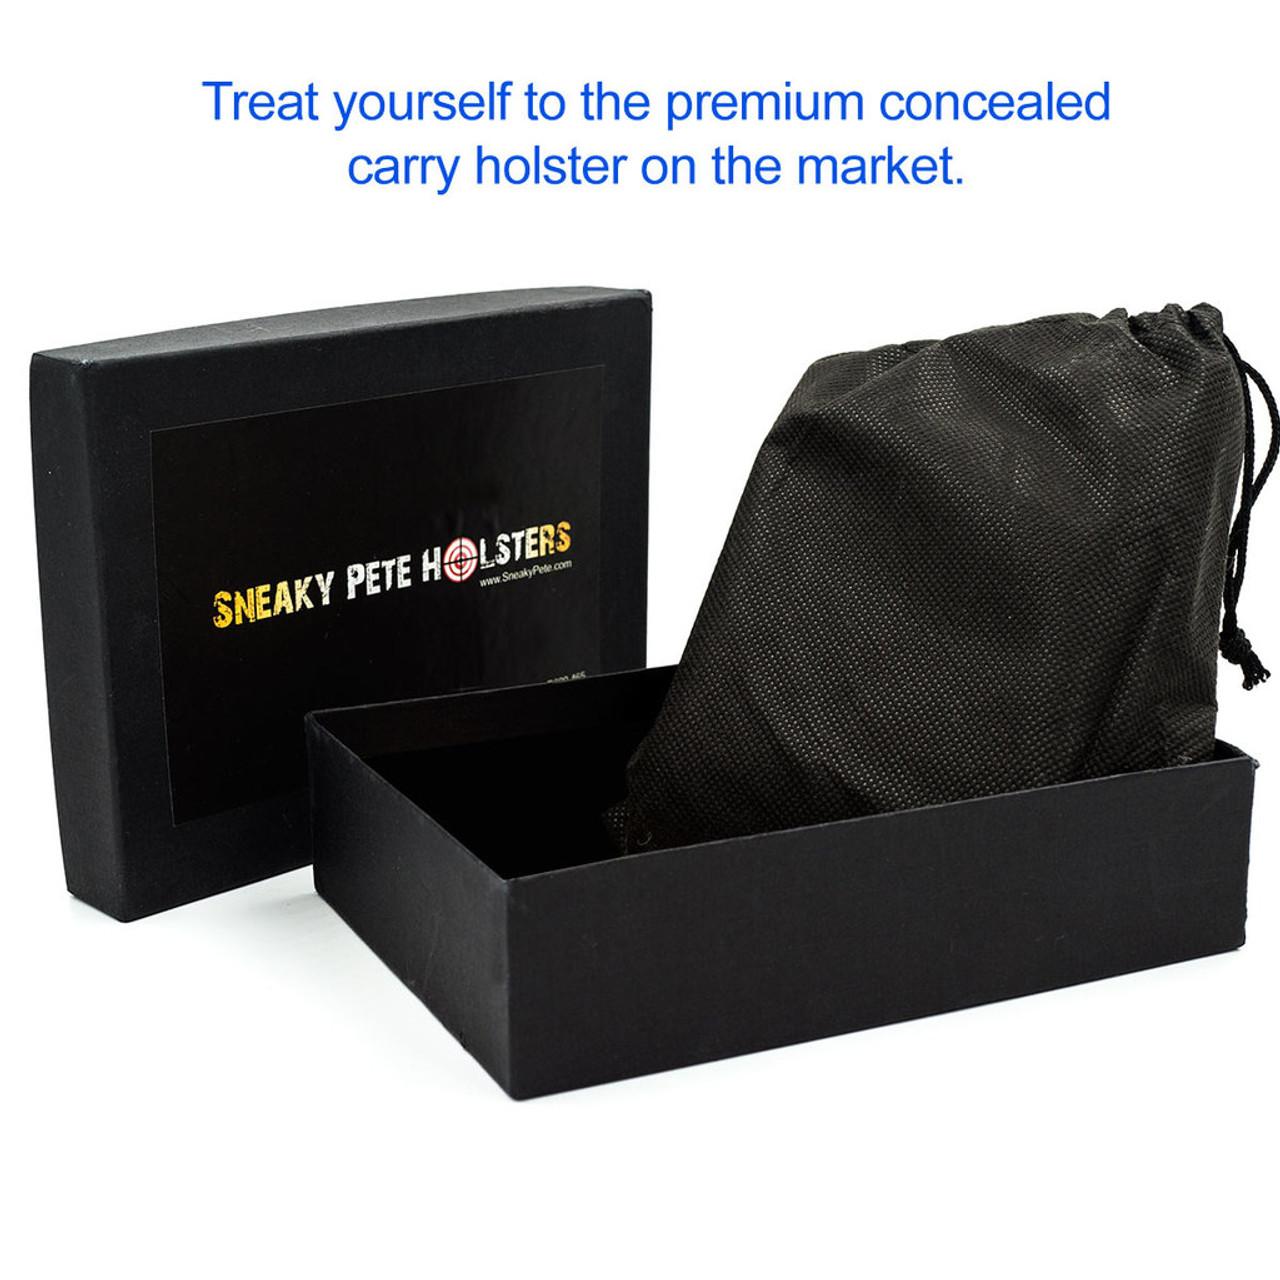 BodyGuard 380  Value Package 1